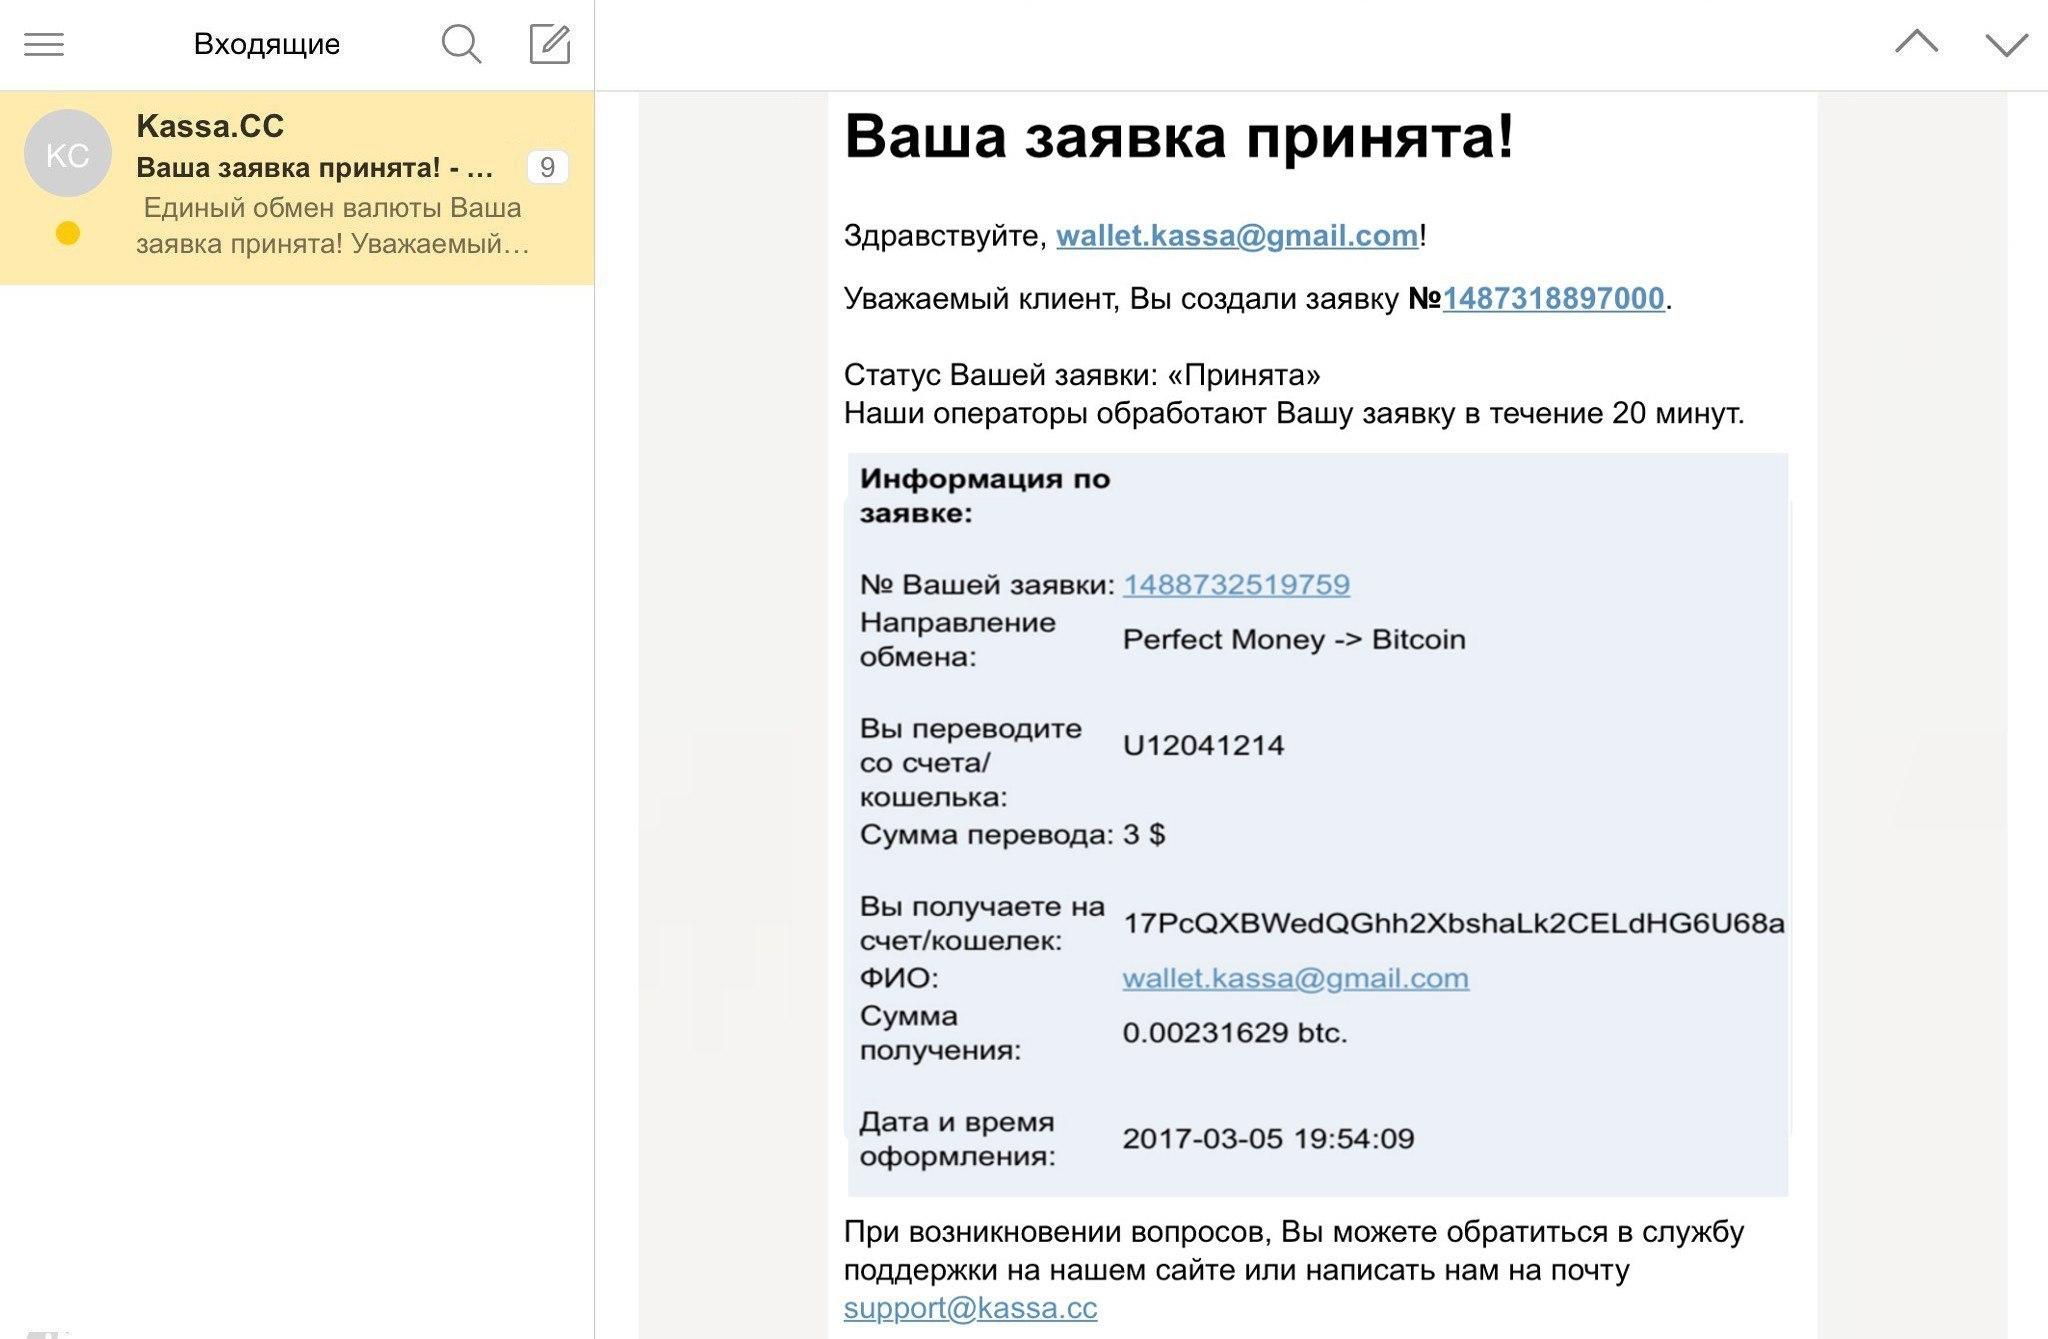 Kassa.cc - единый обмен валюты. Обмен Perfect Money USD на Bitcoin